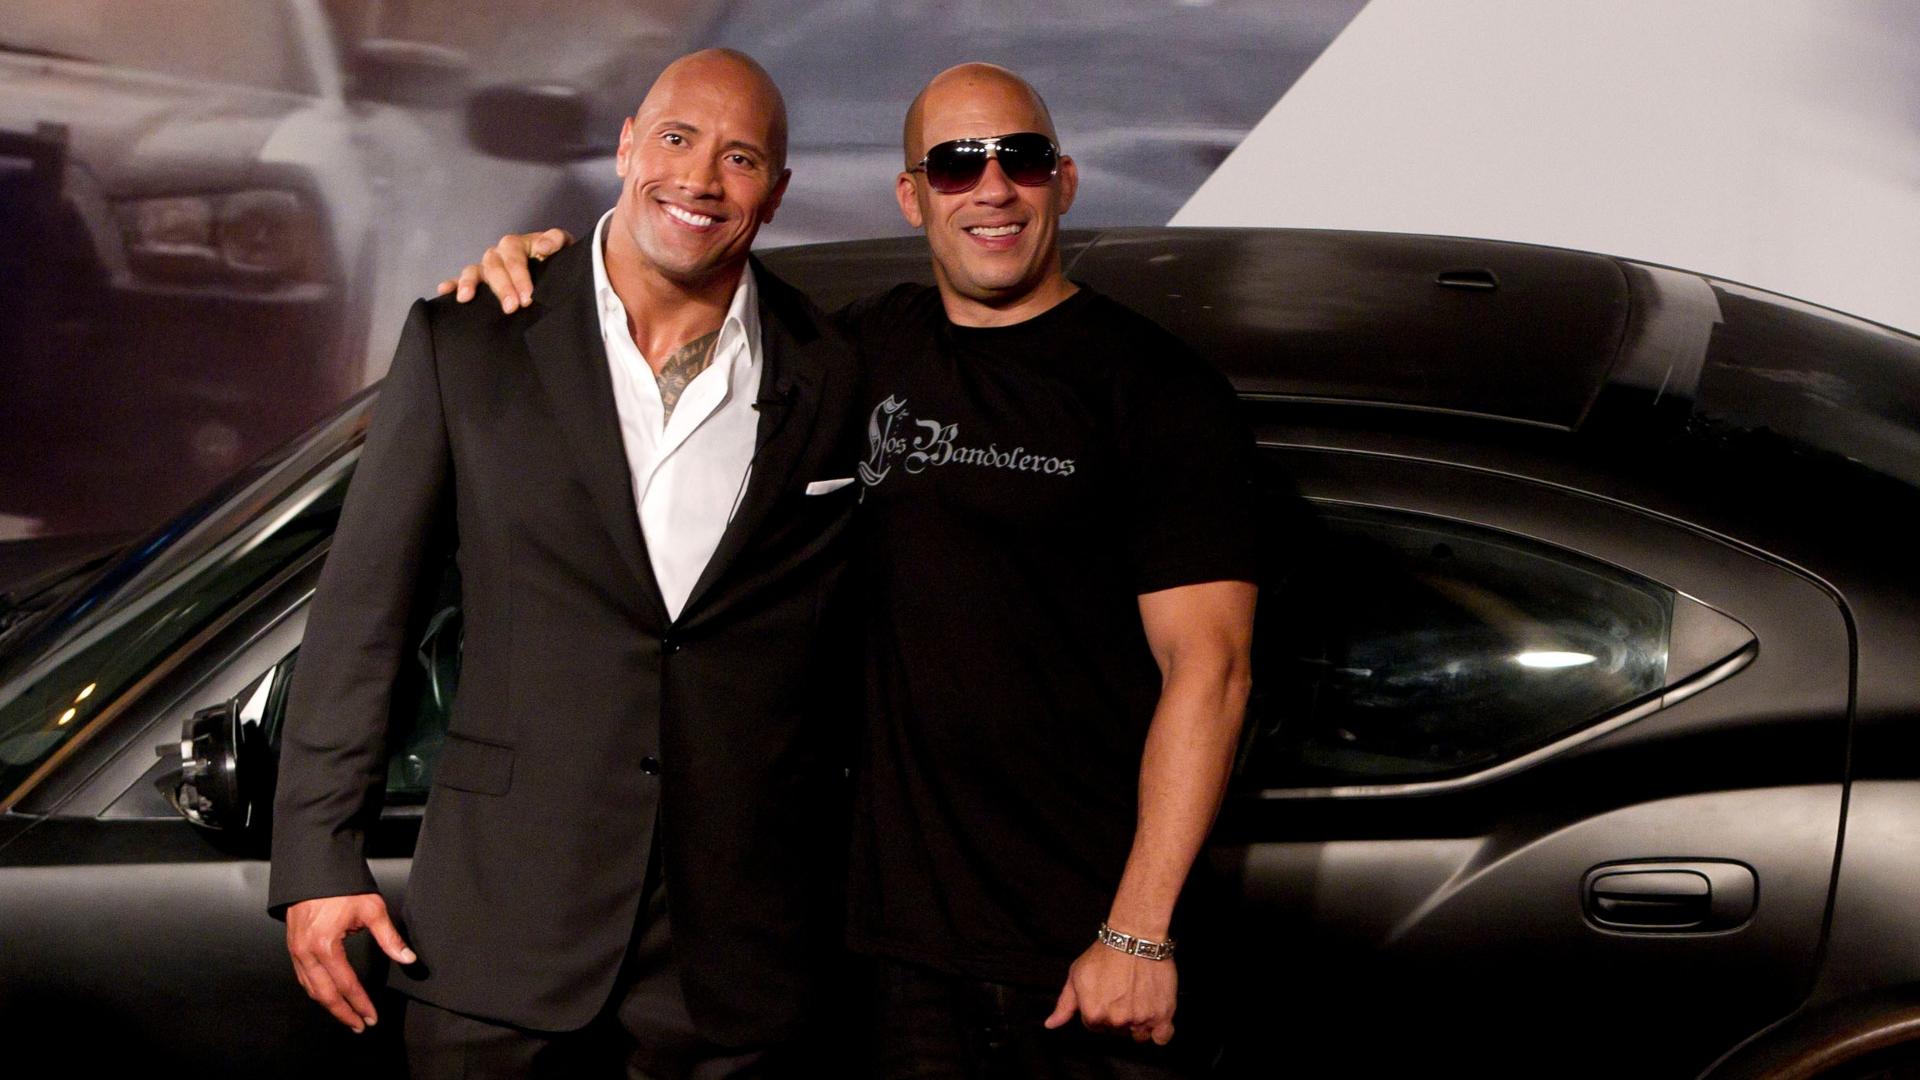 Dwayne Johnson Vin Diesel End Their Fast And Furious Feud